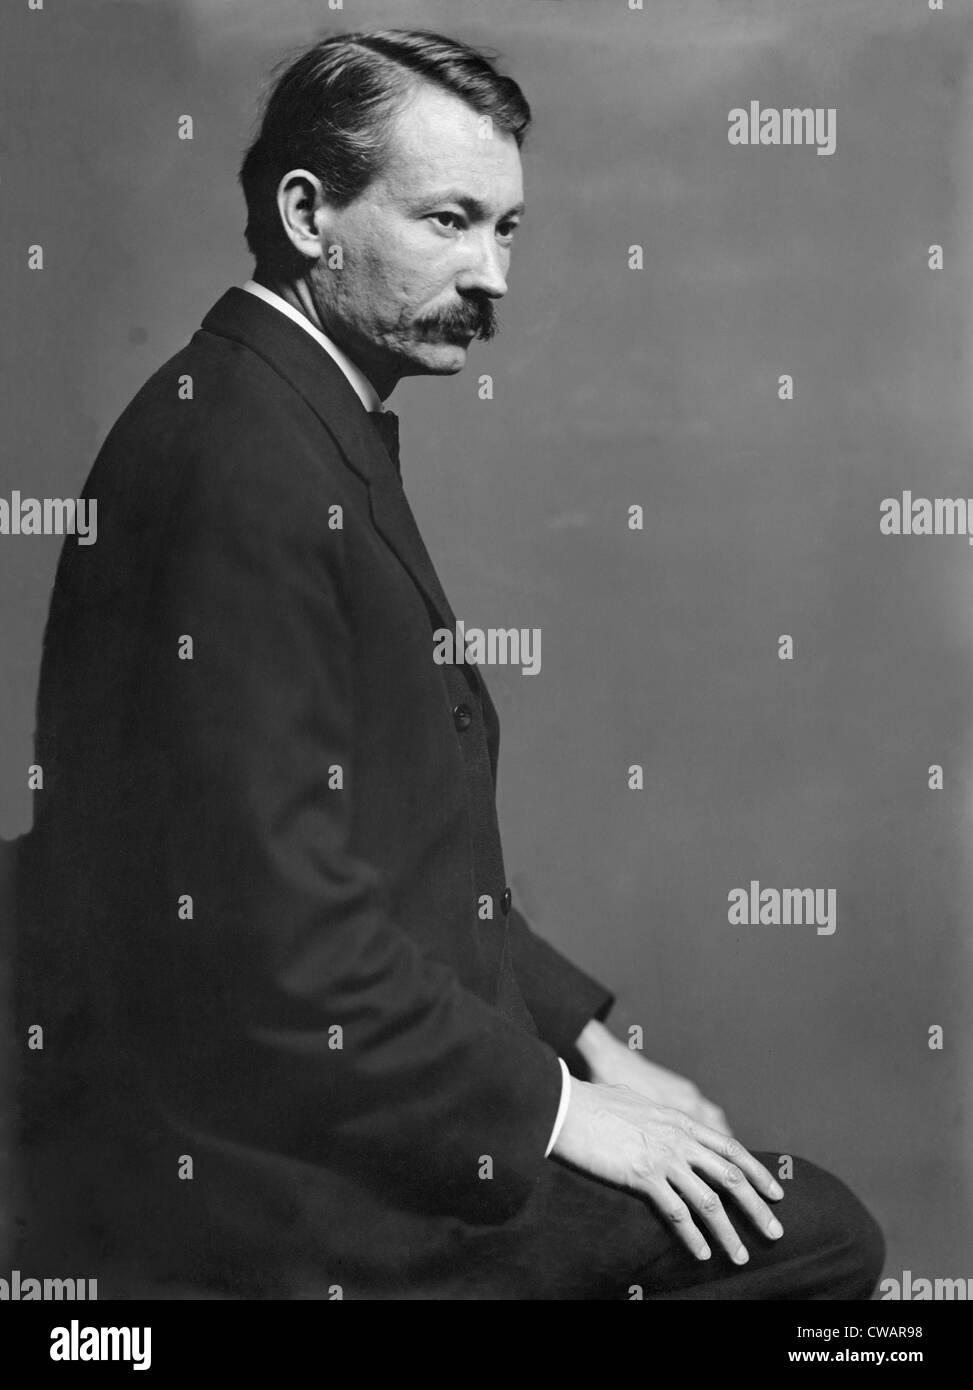 Robert Henri (1865-1929), the American painter, posed in the Gertrude Kasebier's New York City studio in 1900. - Stock Image